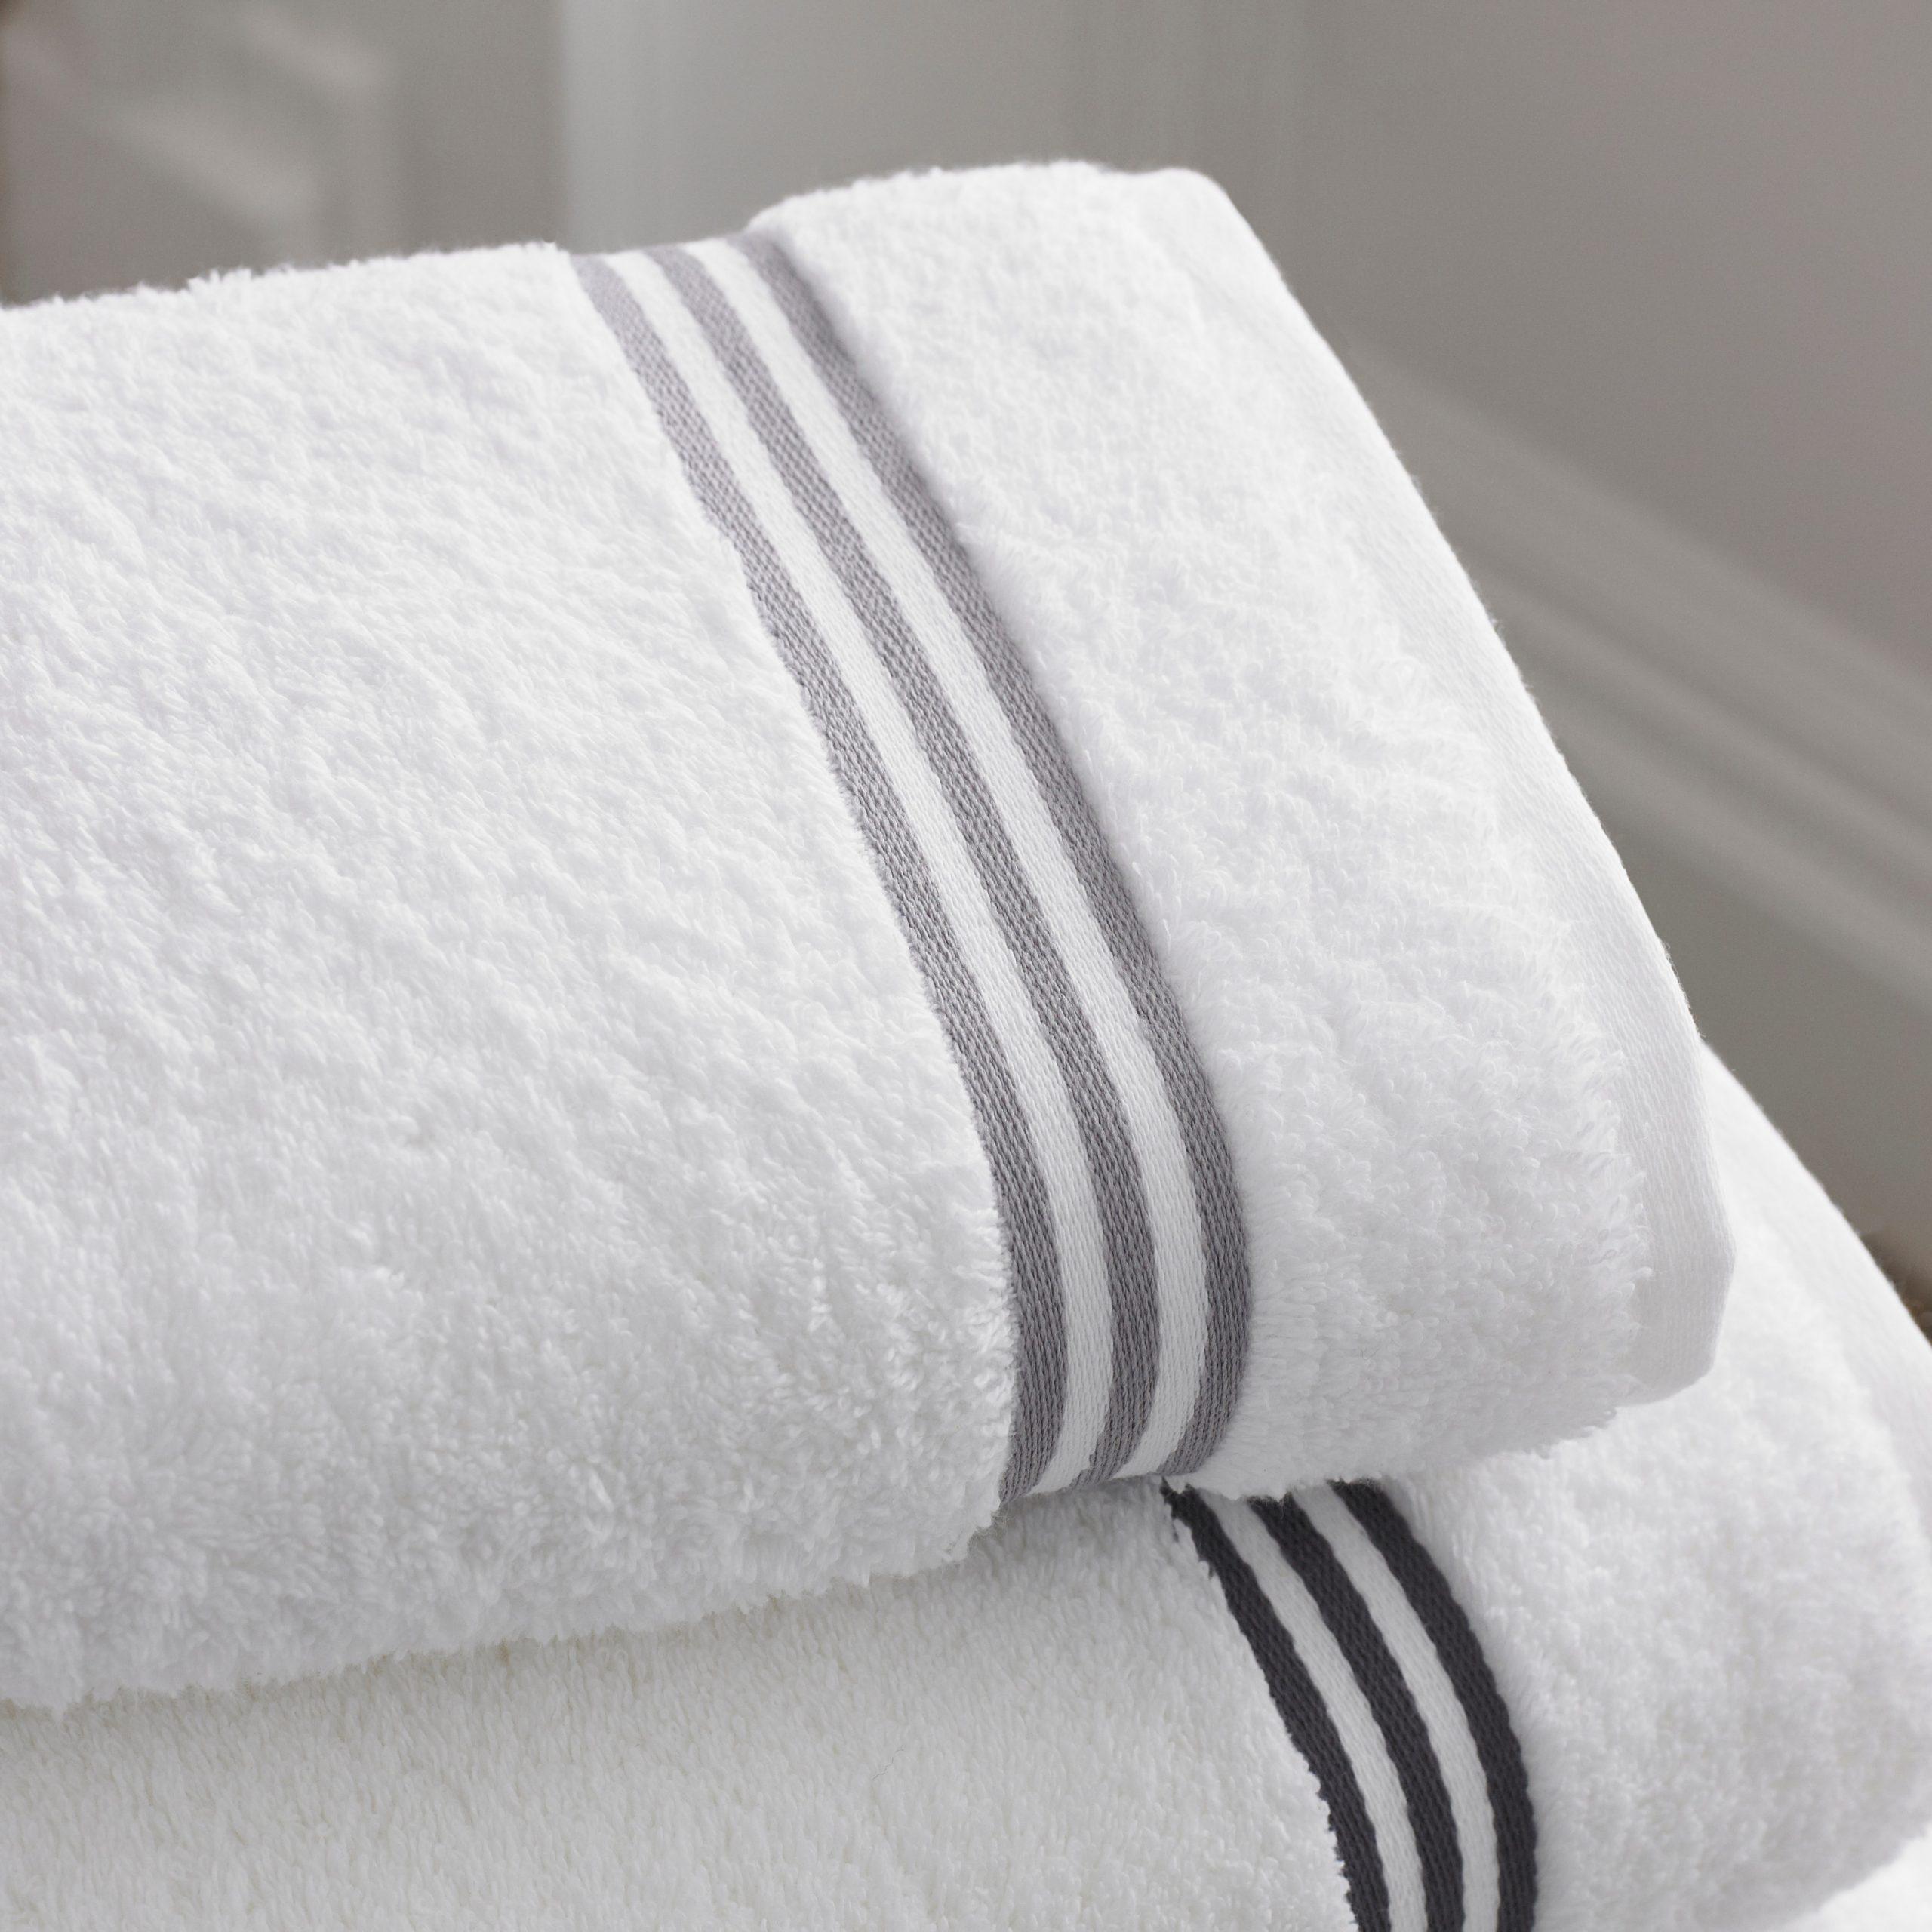 towels-bath-bathroom-12679